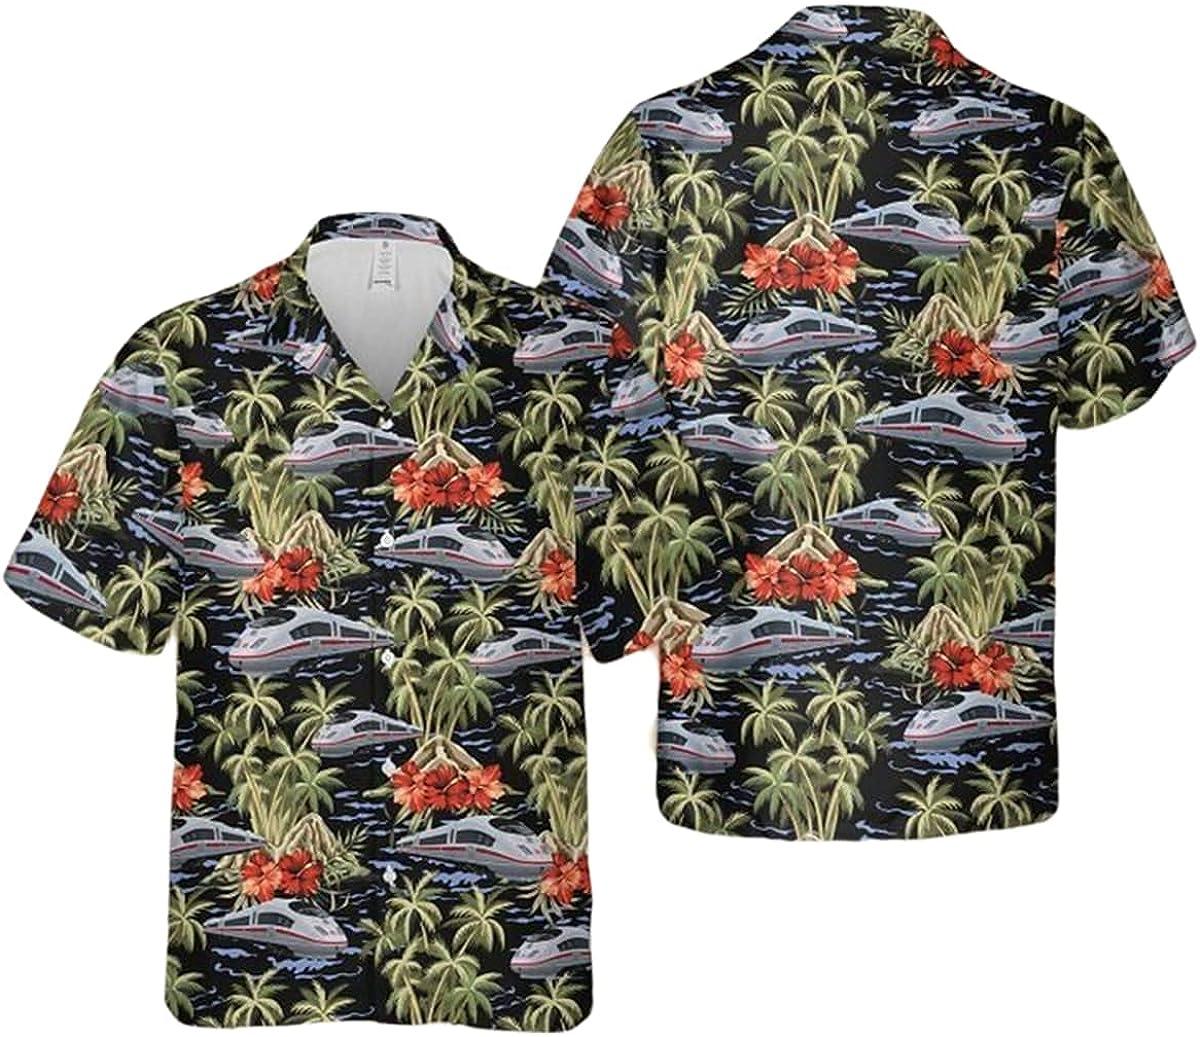 German Deutsche Bahn Ice Palm Hawaiian Tree Max 80% OFF Shirt Pattern Unisex Dallas Mall